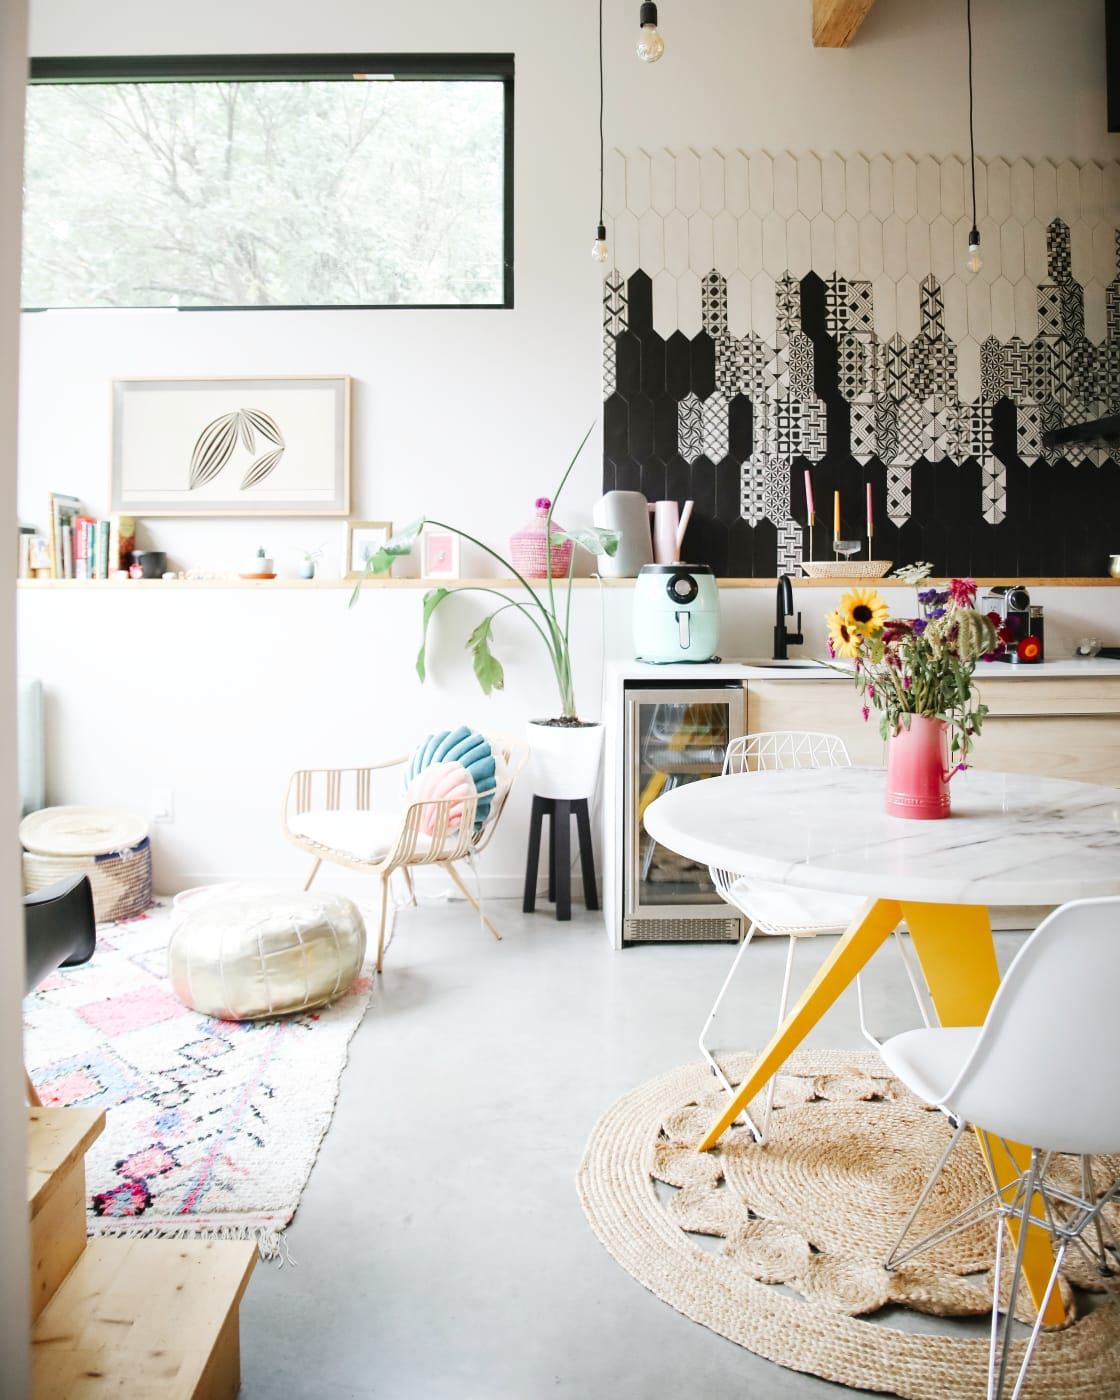 A Modern Kitchen: Add tiles!